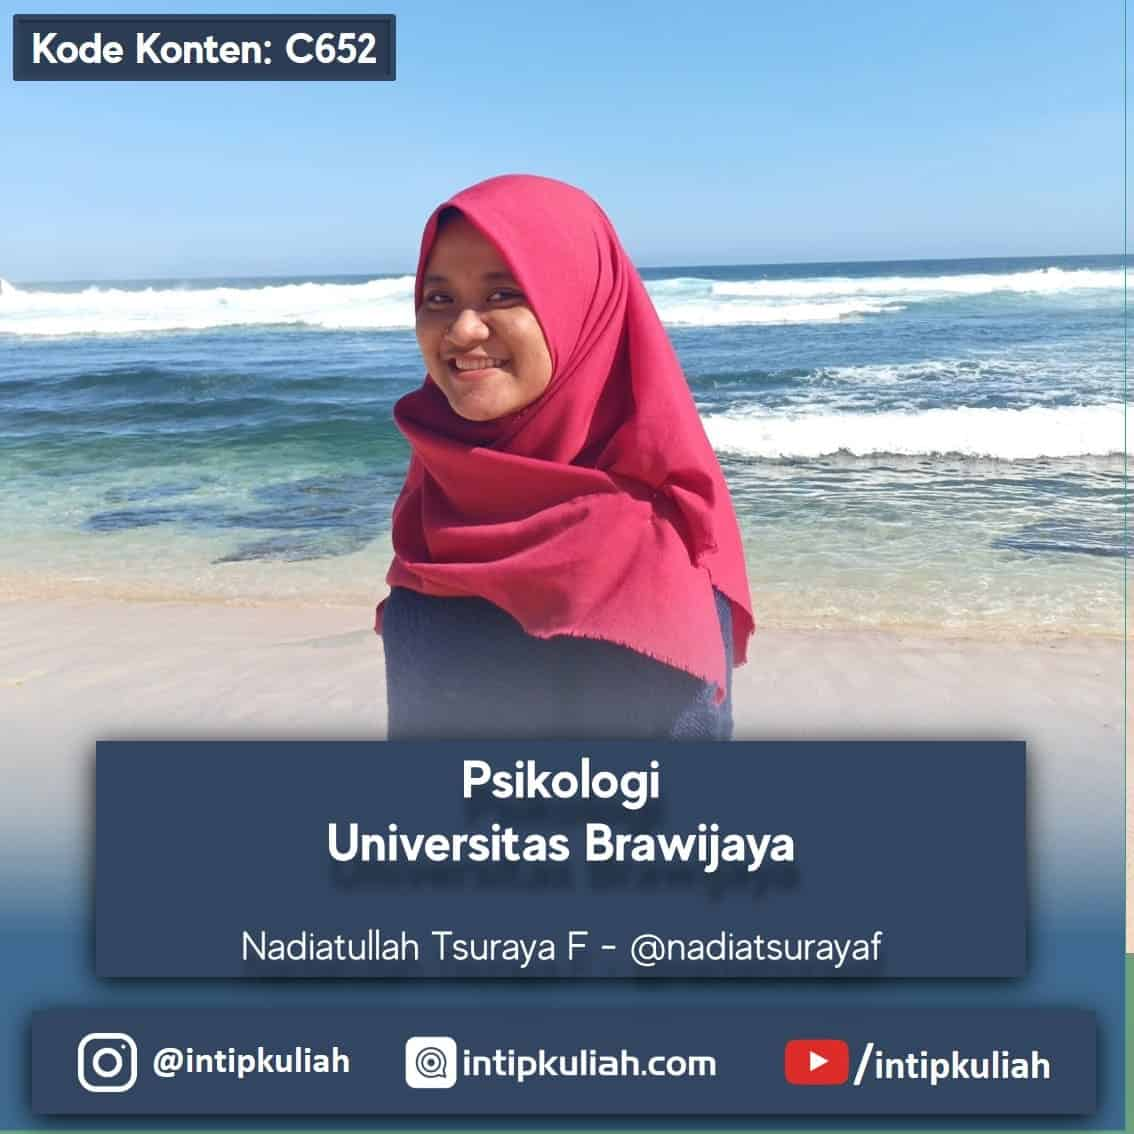 Psikologi Universitas Brawijaya (Nadiatullah)